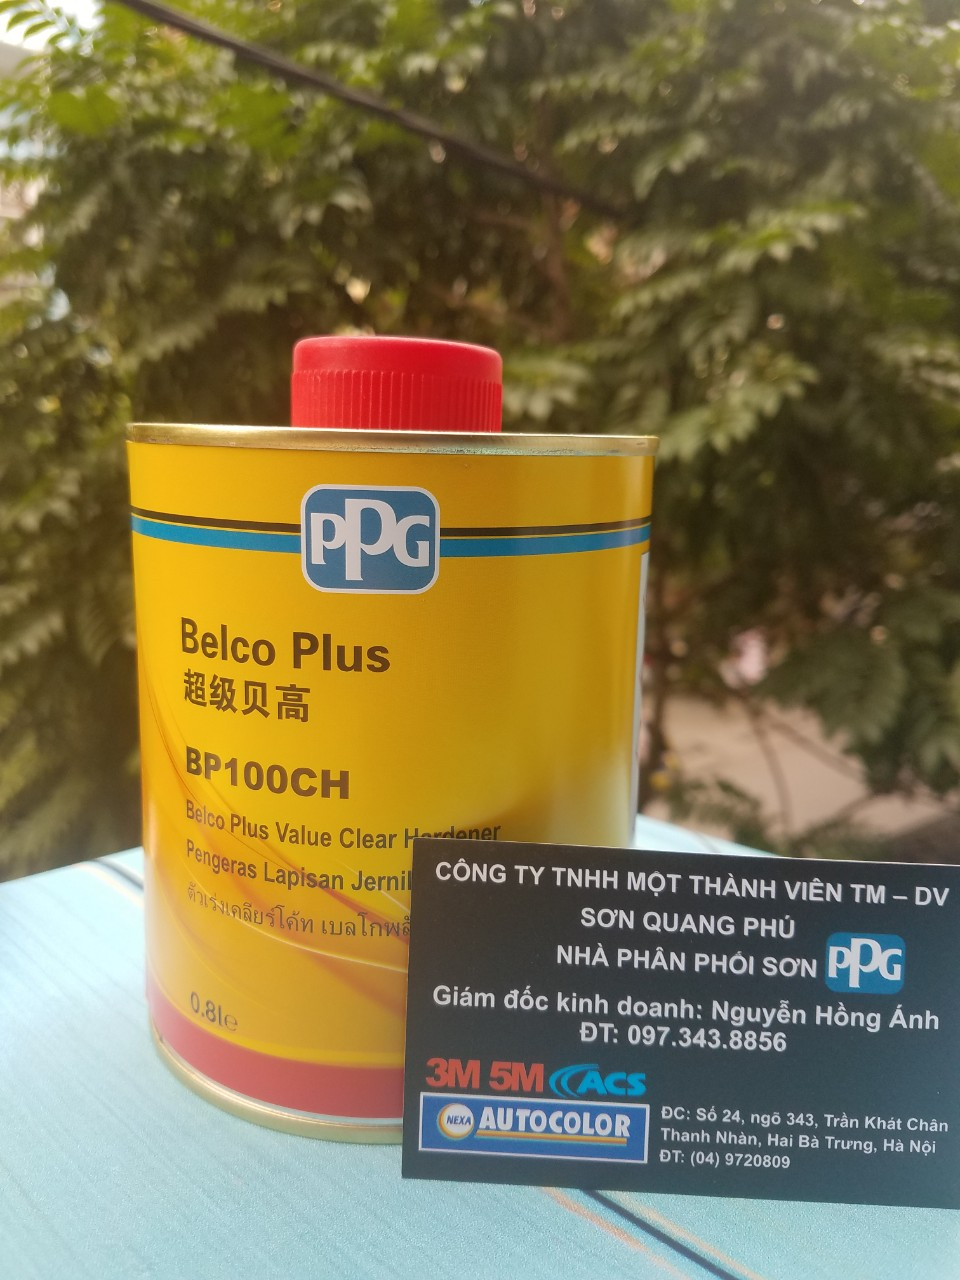 bp100ch-dong-ran-belco-0-8l